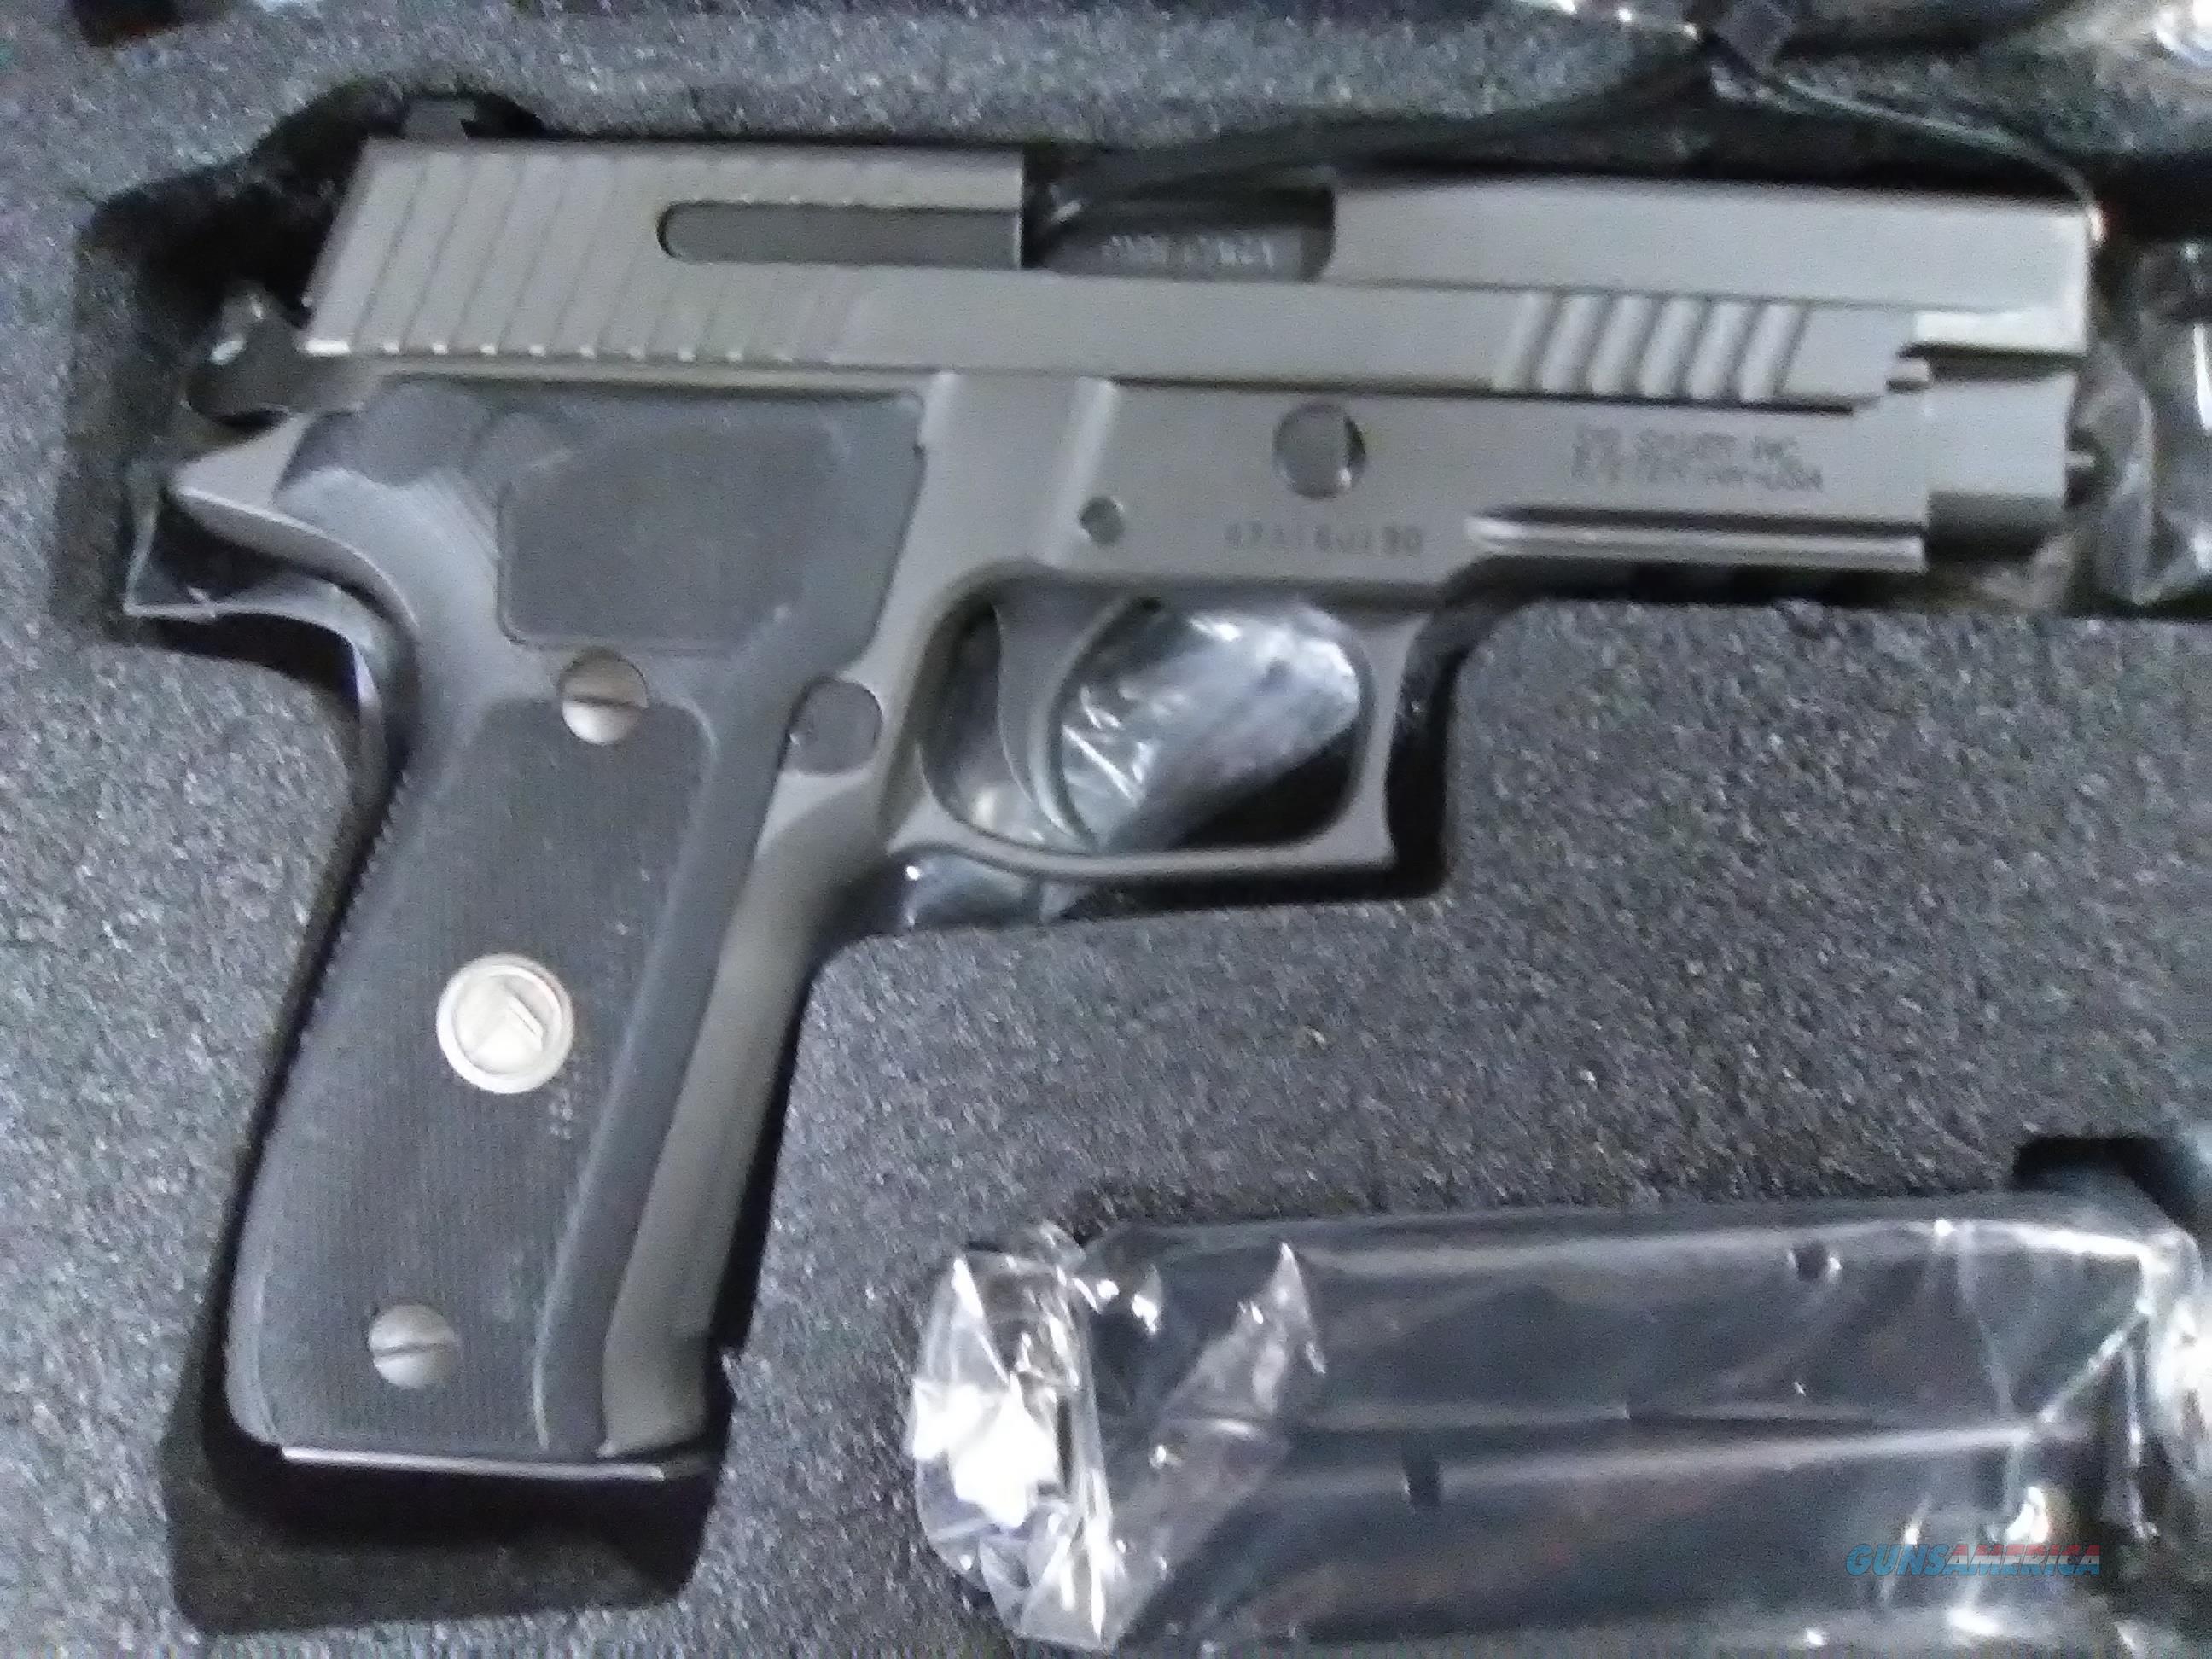 SIG SAUER P226 LEGION 9MM 15+1 DA/SA E26R-9-LEGION  Guns > Pistols > Sig - Sauer/Sigarms Pistols > P226